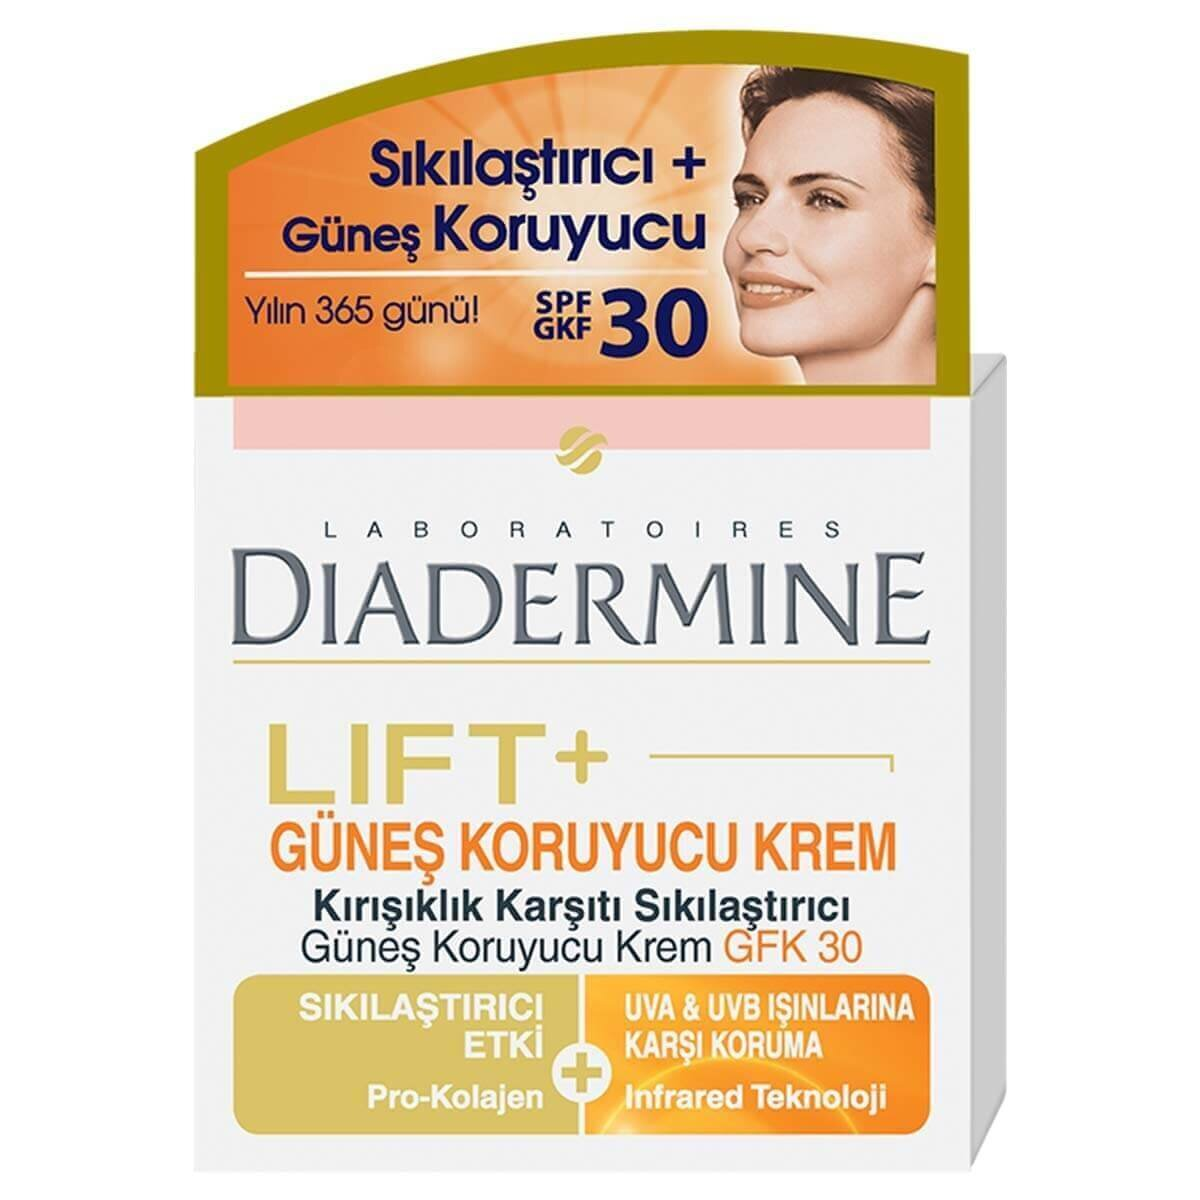 Lift+ Sun Protect Spf 30 50 ml